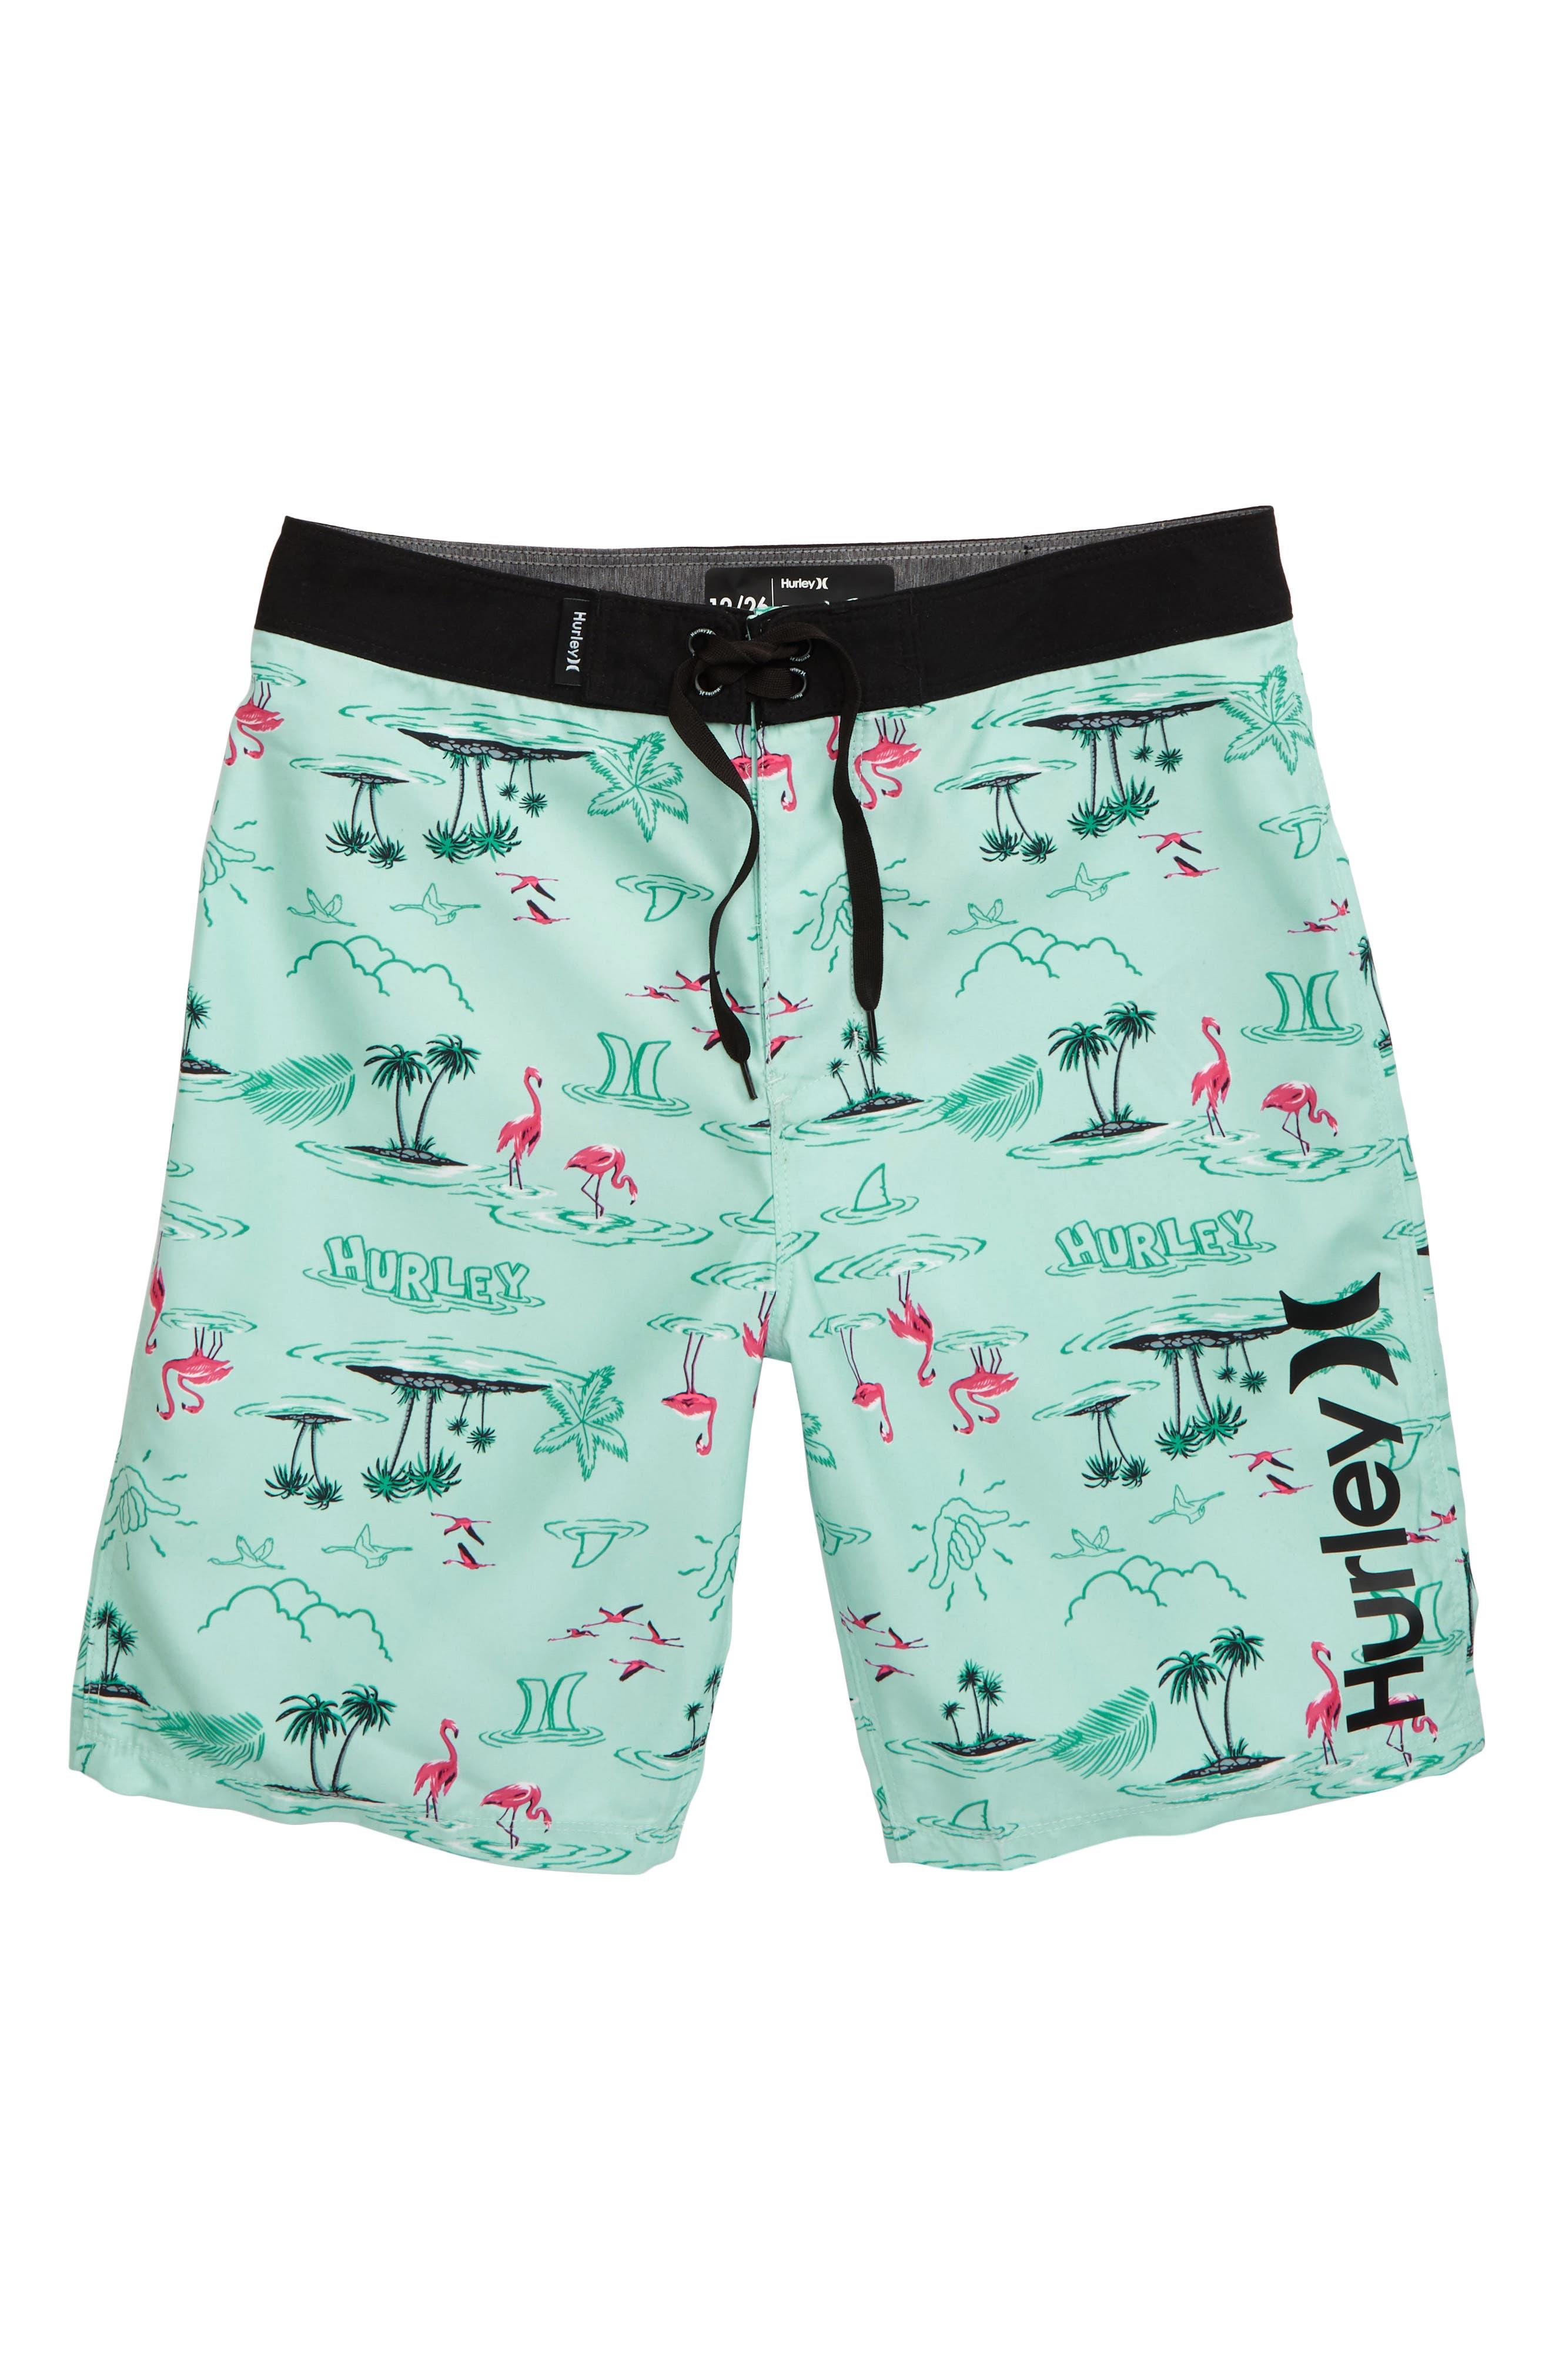 Boys Hurley Flamingo Board Shorts Size 8  Bluegreen